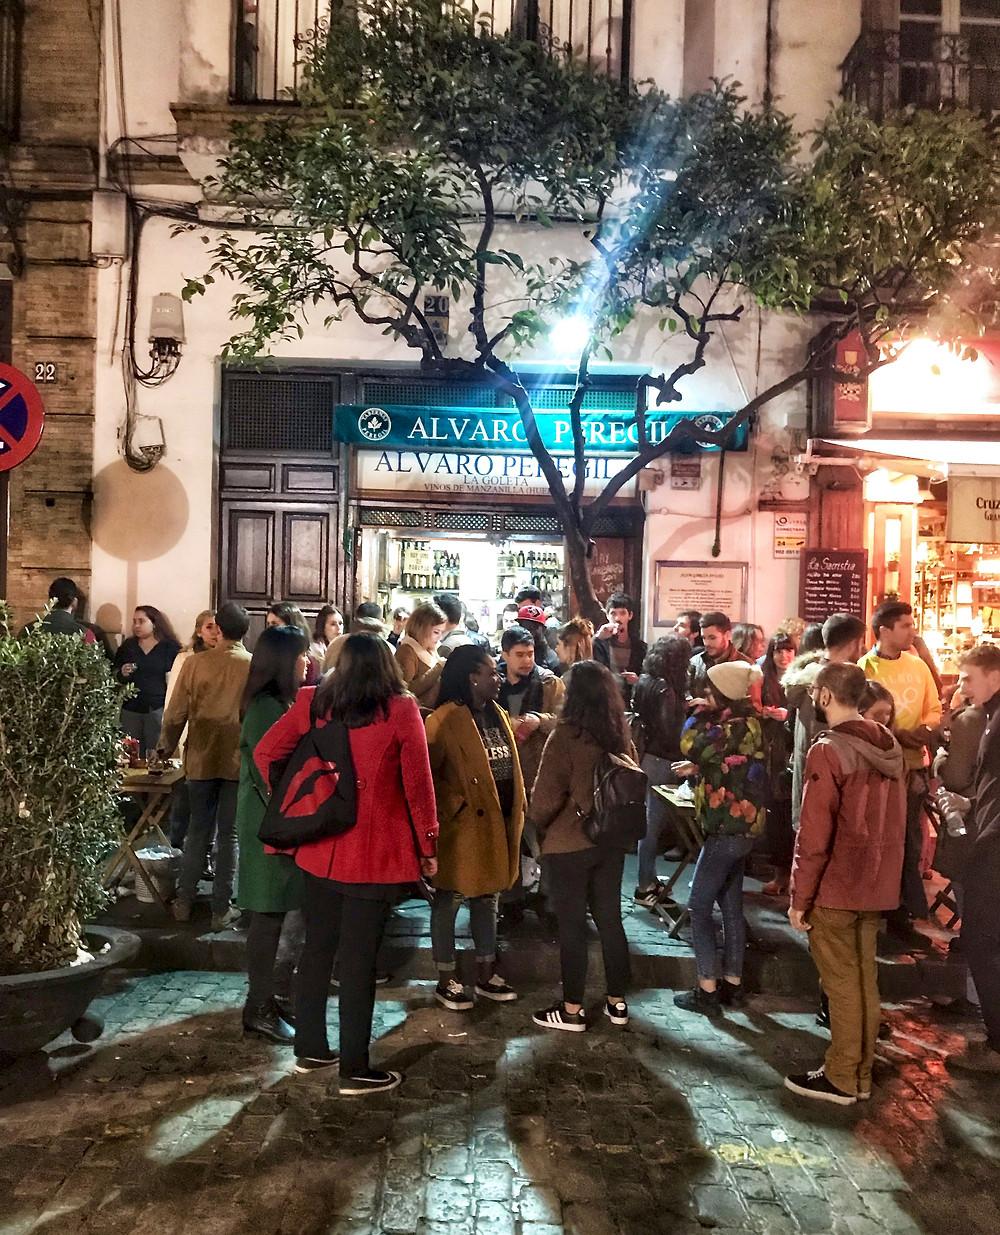 Alvara Peregil Tapas Bar -- so mobbed in February that no one fits inside.